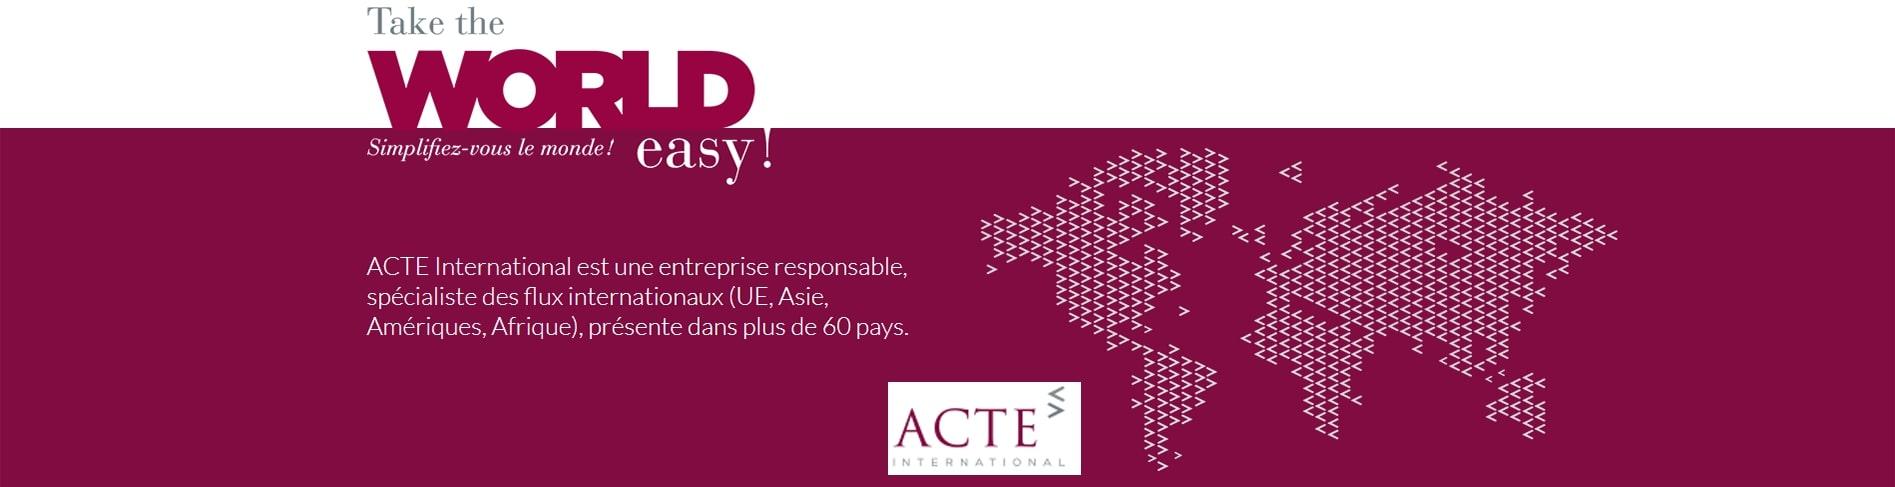 Acte International témoignage altica